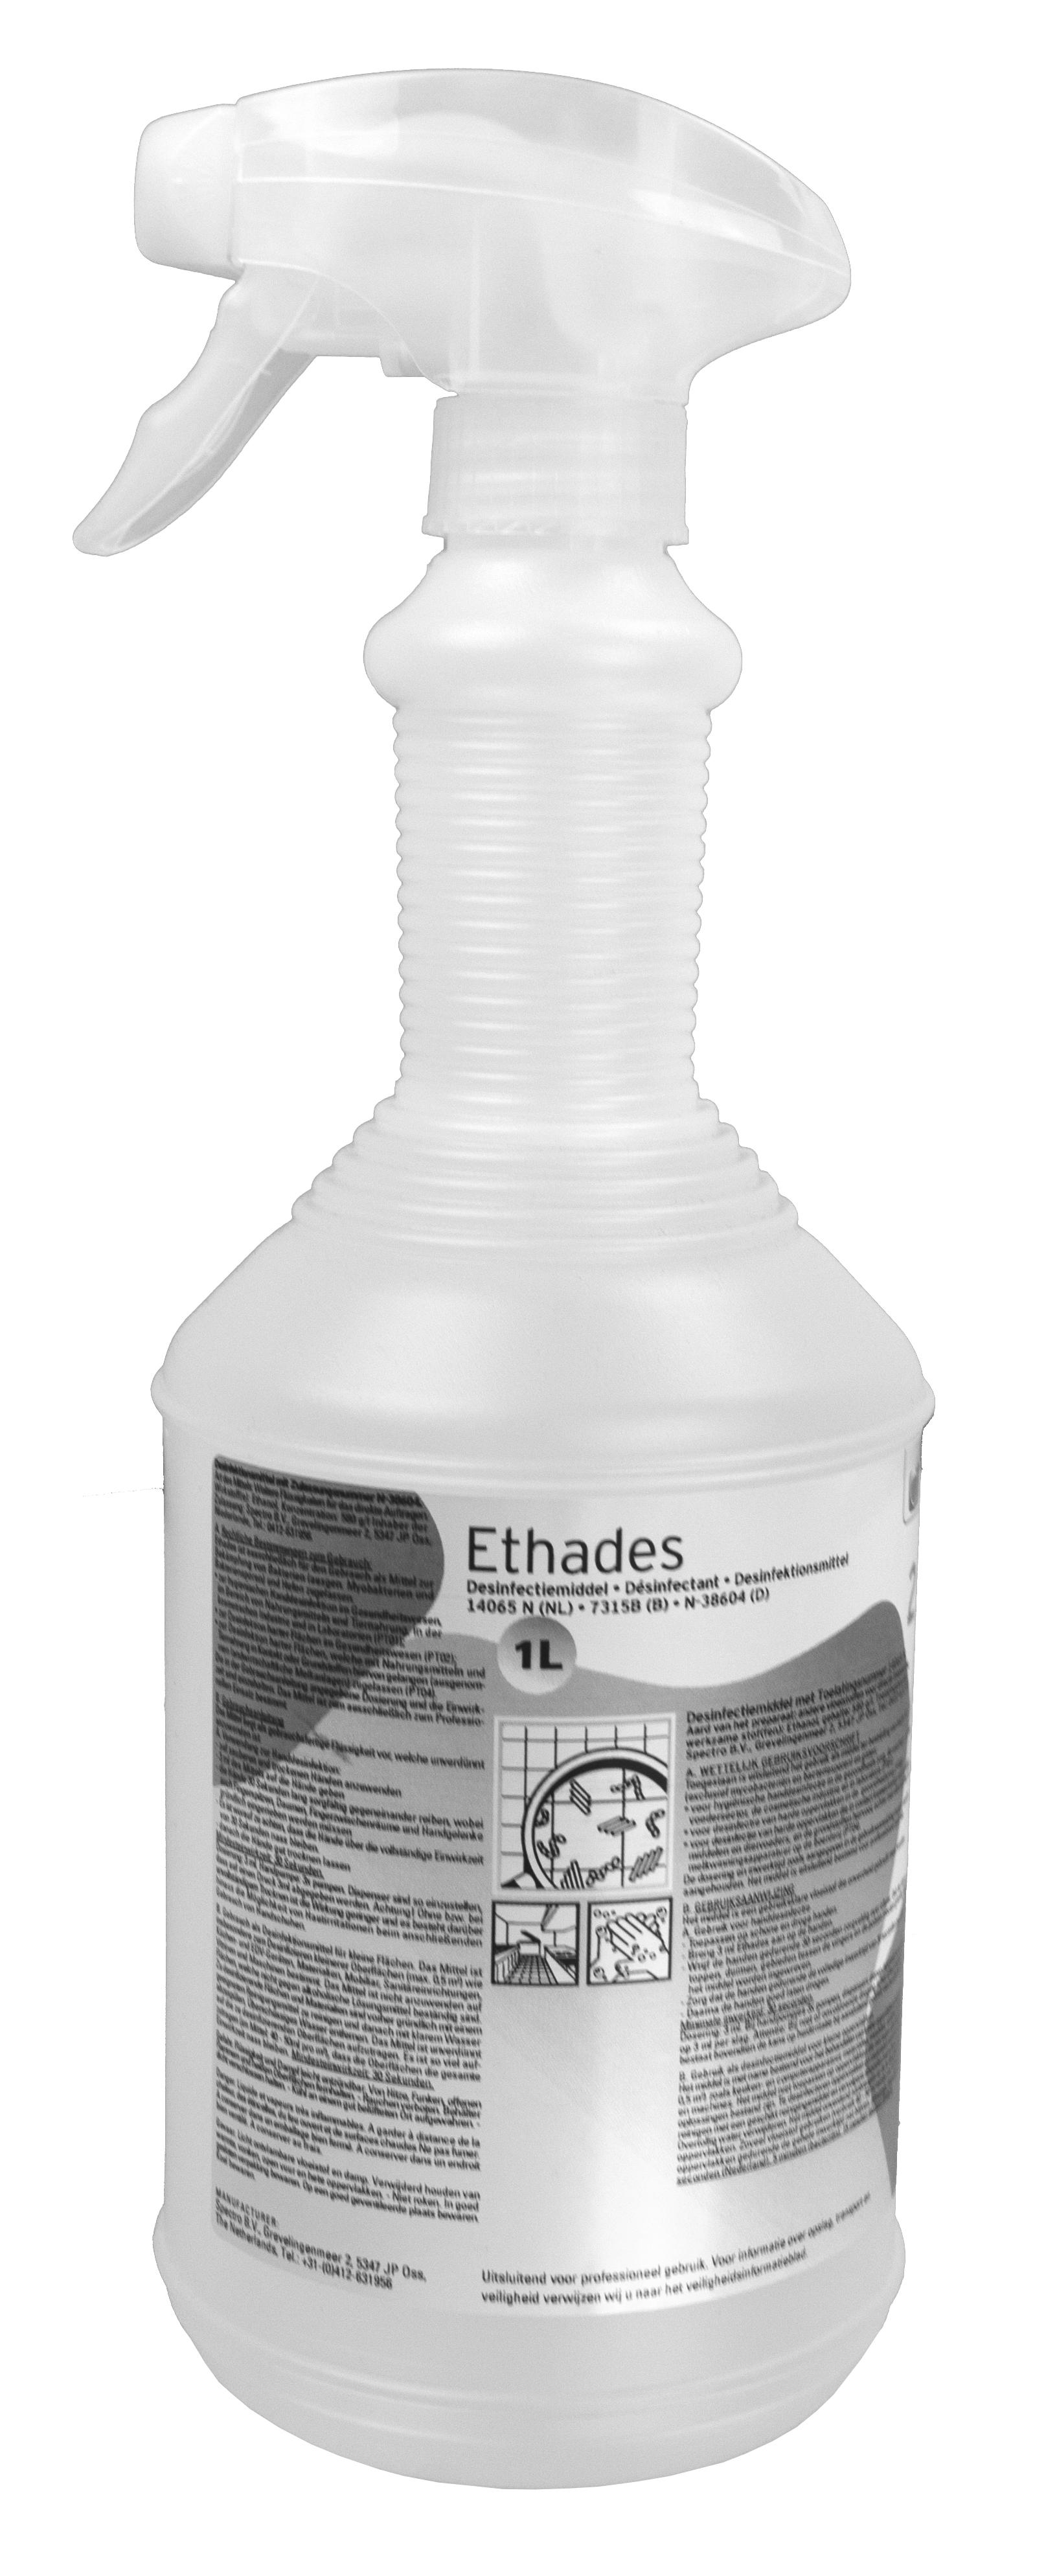 Ethades desinfectant spray